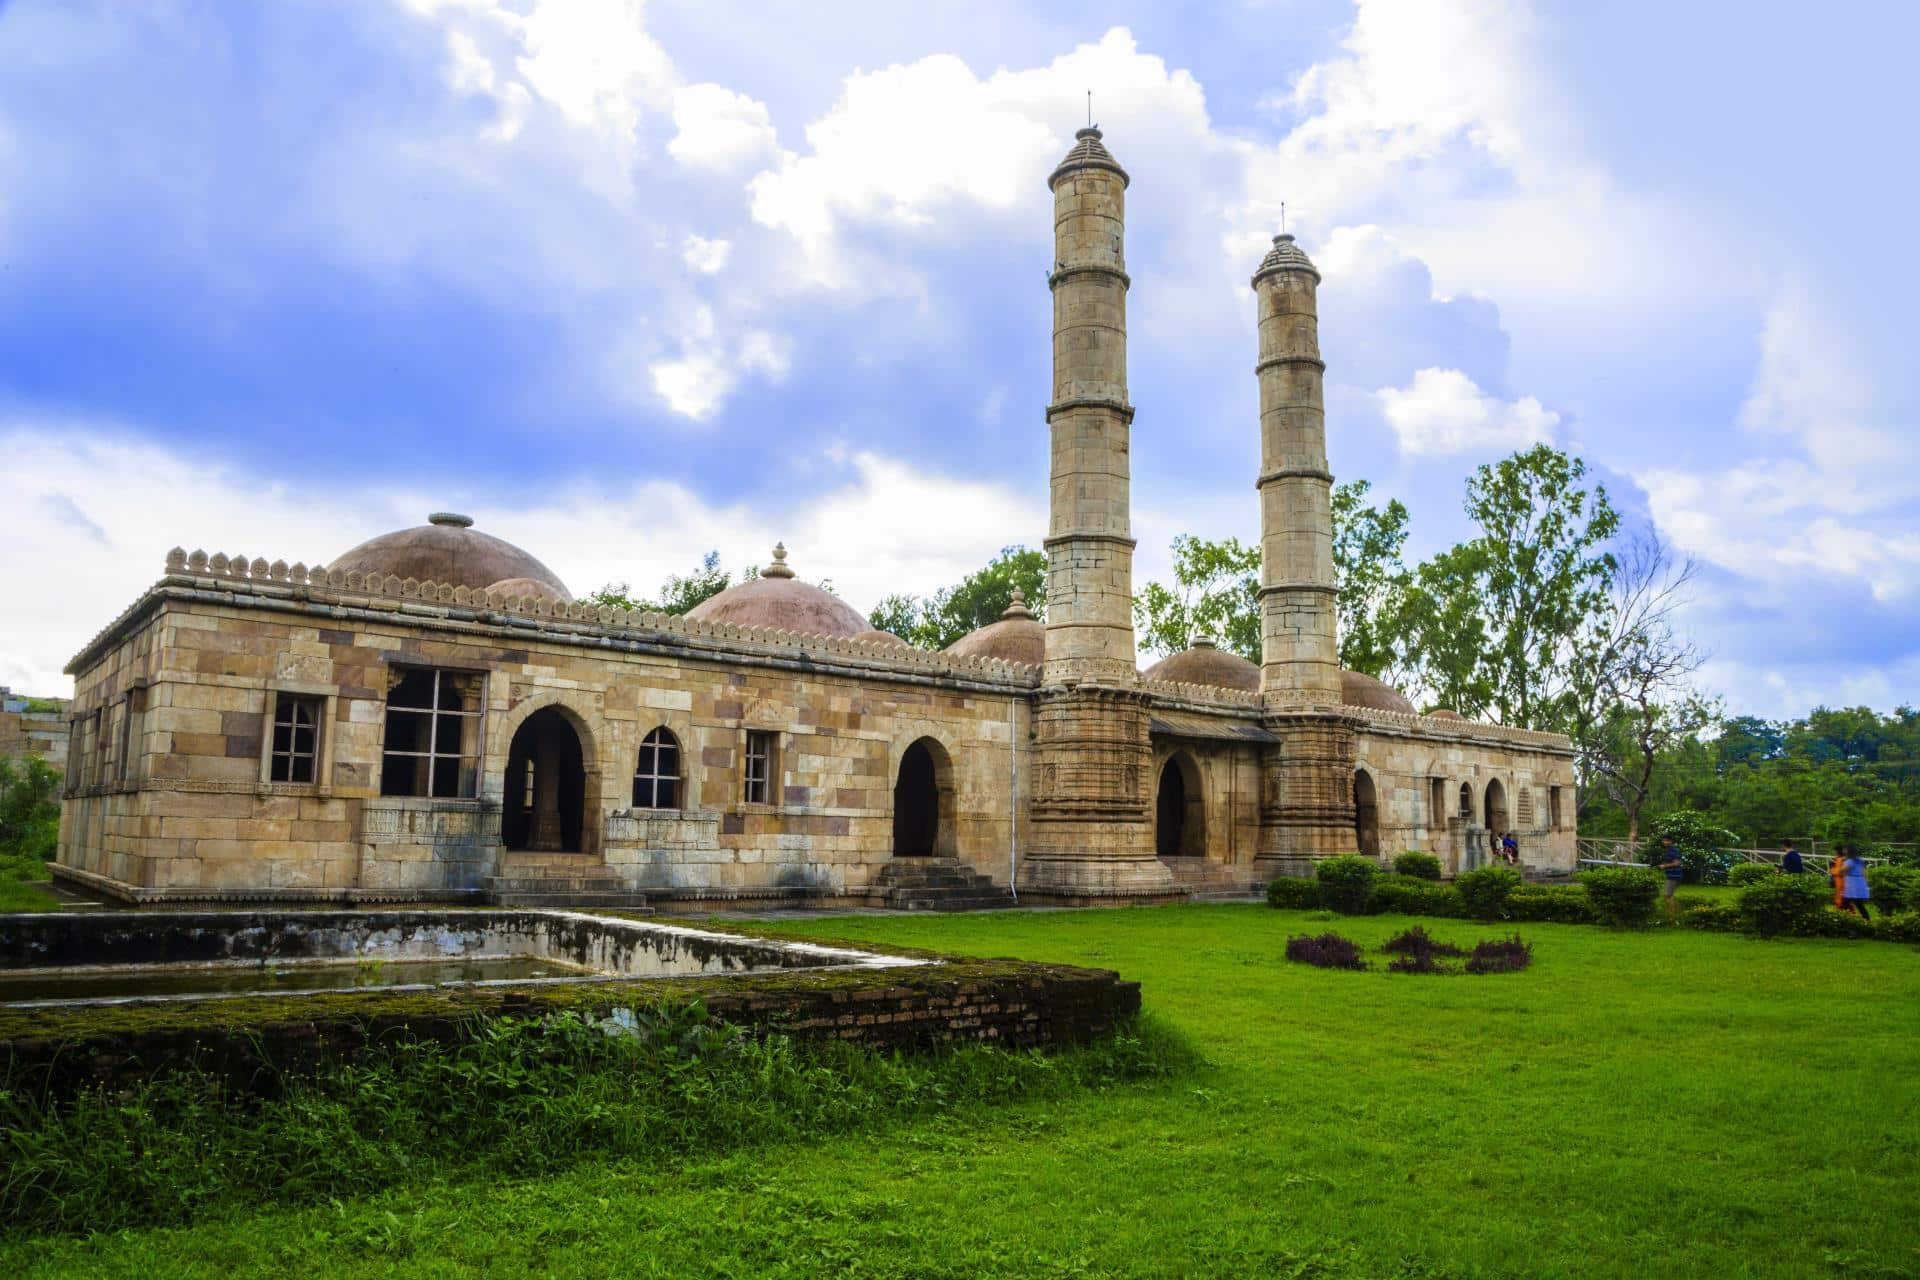 Mumbai, Gujarat and Rajasthan Exotic Cities 7